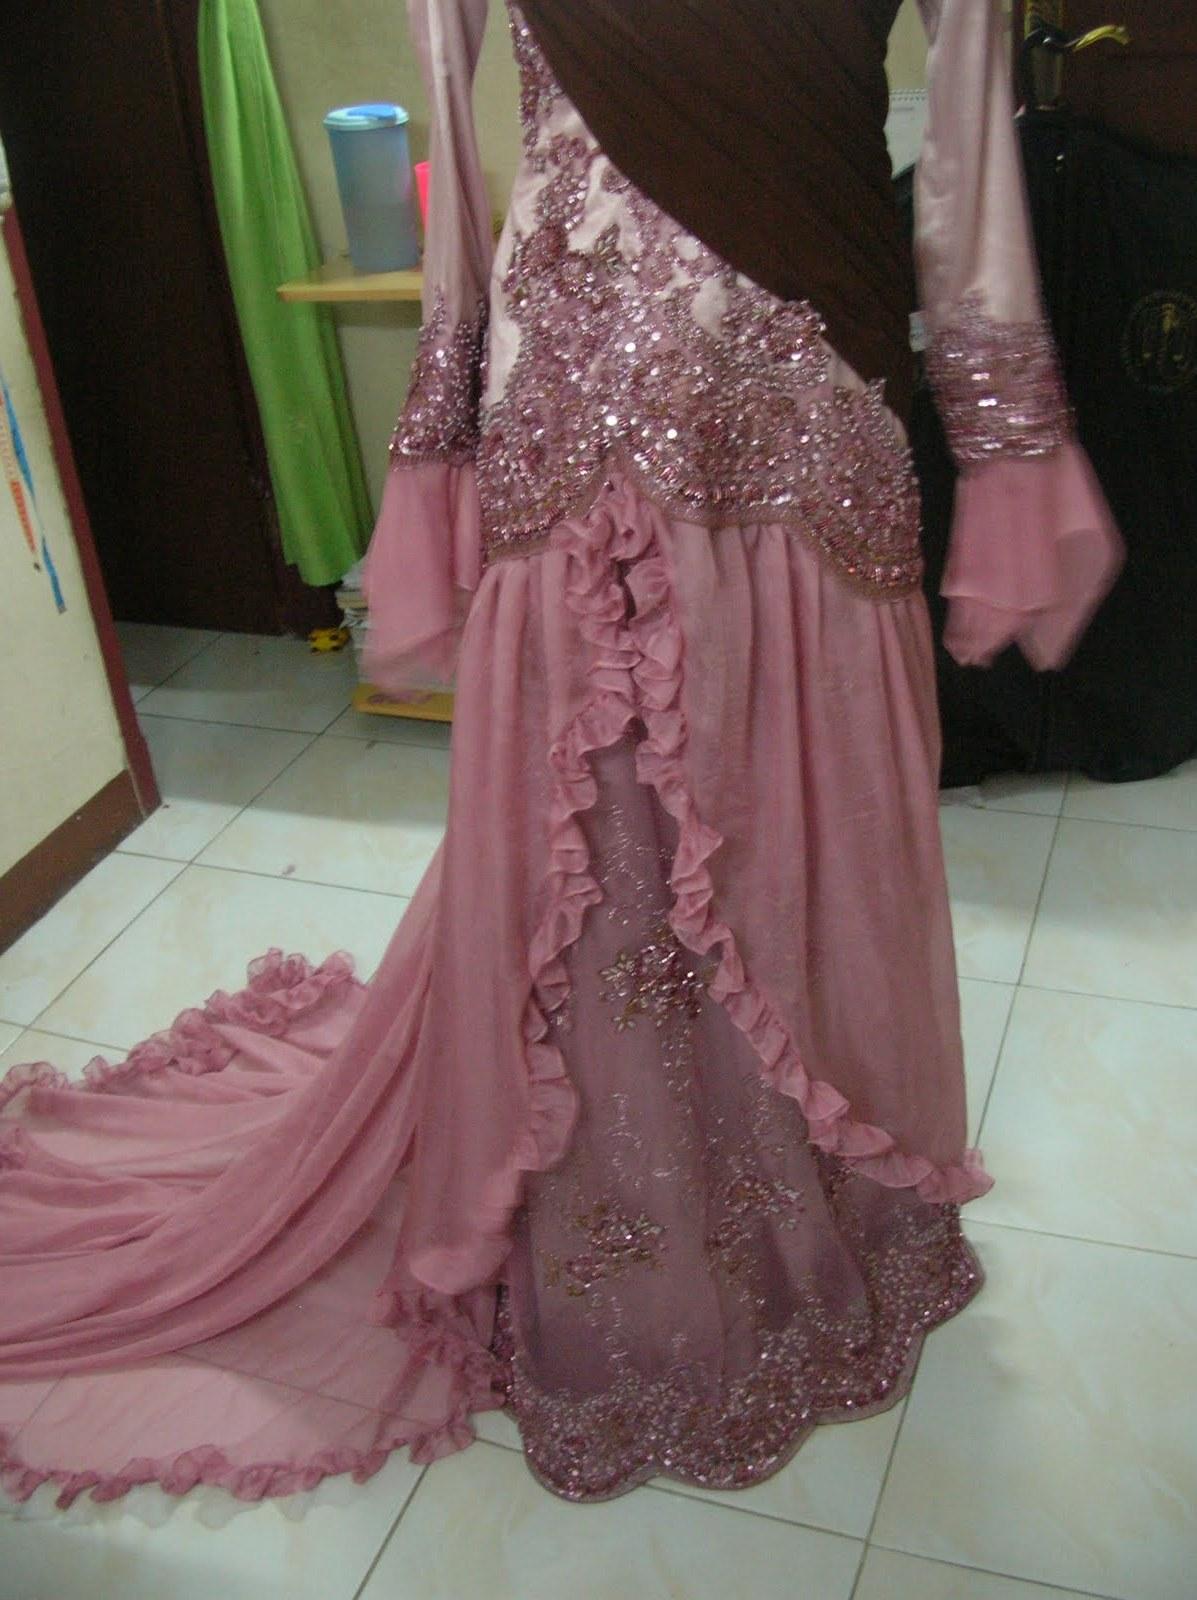 Design Gaun Pengantin Muslimah Syar'i Rabbani O2d5 Gaun Pengantin Muslimah 2012